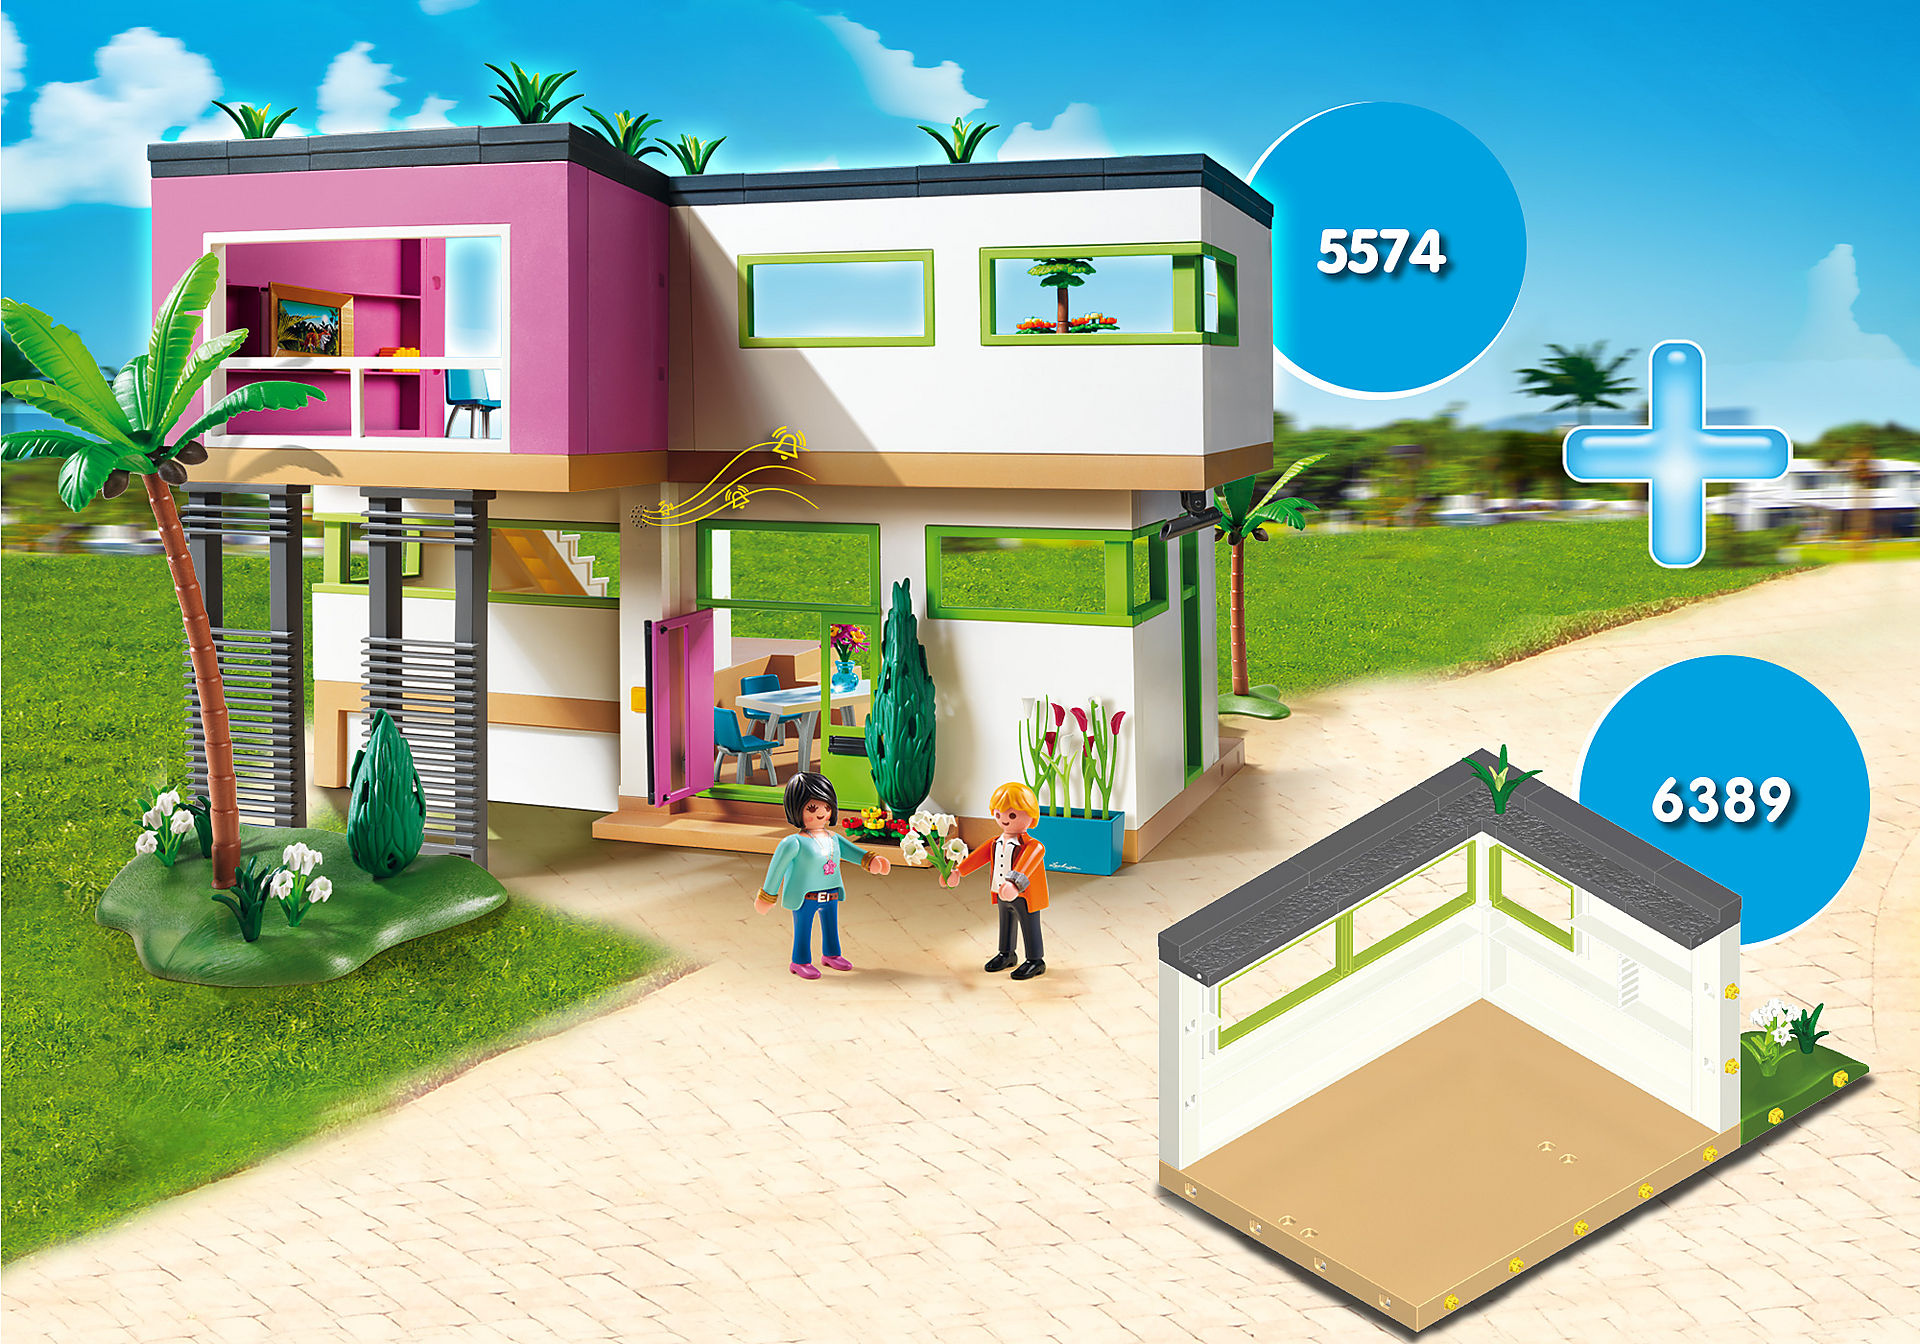 PM1905K Super Promo Bundle Lussuosa Villa arredata zoom image1